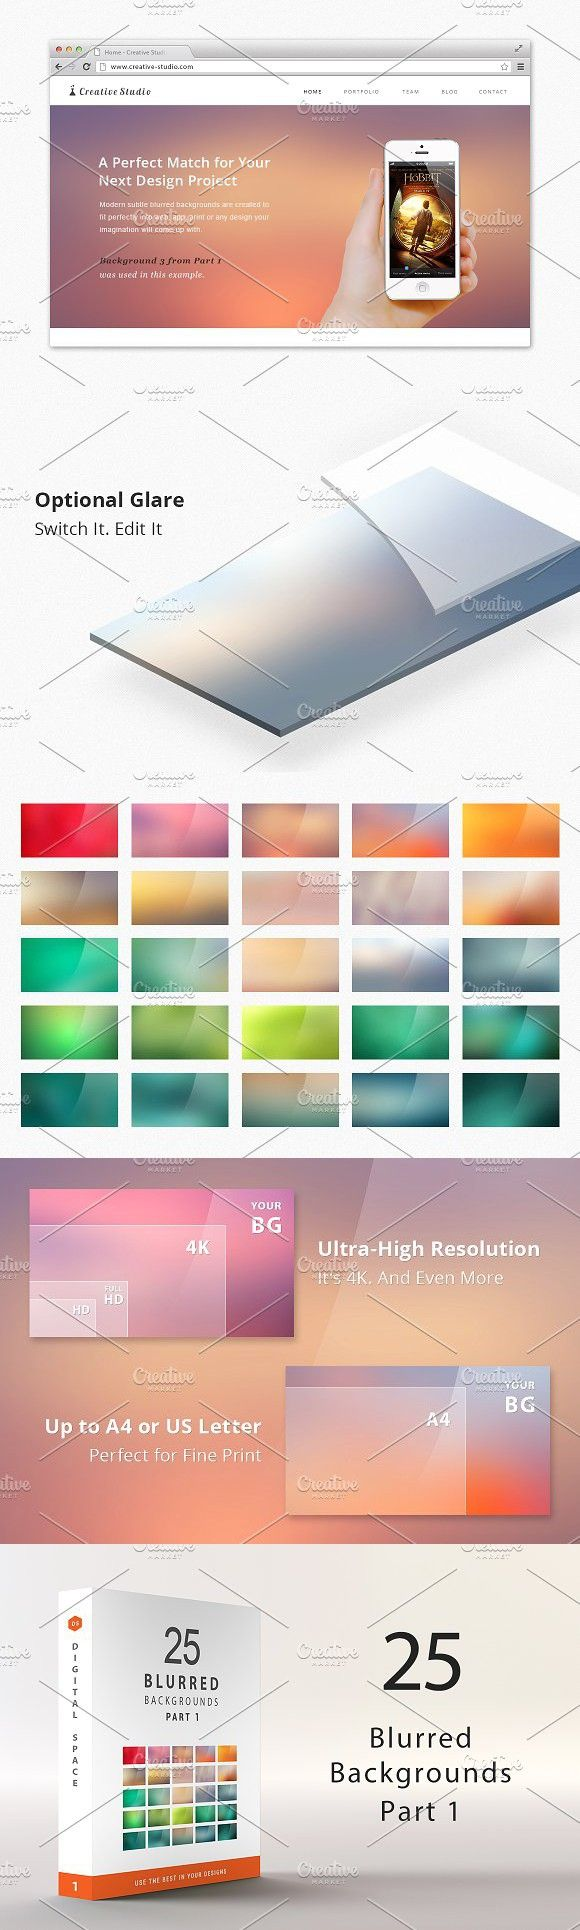 25 Blurred Backgrounds - Part 1 #blurredbackgrounds #background